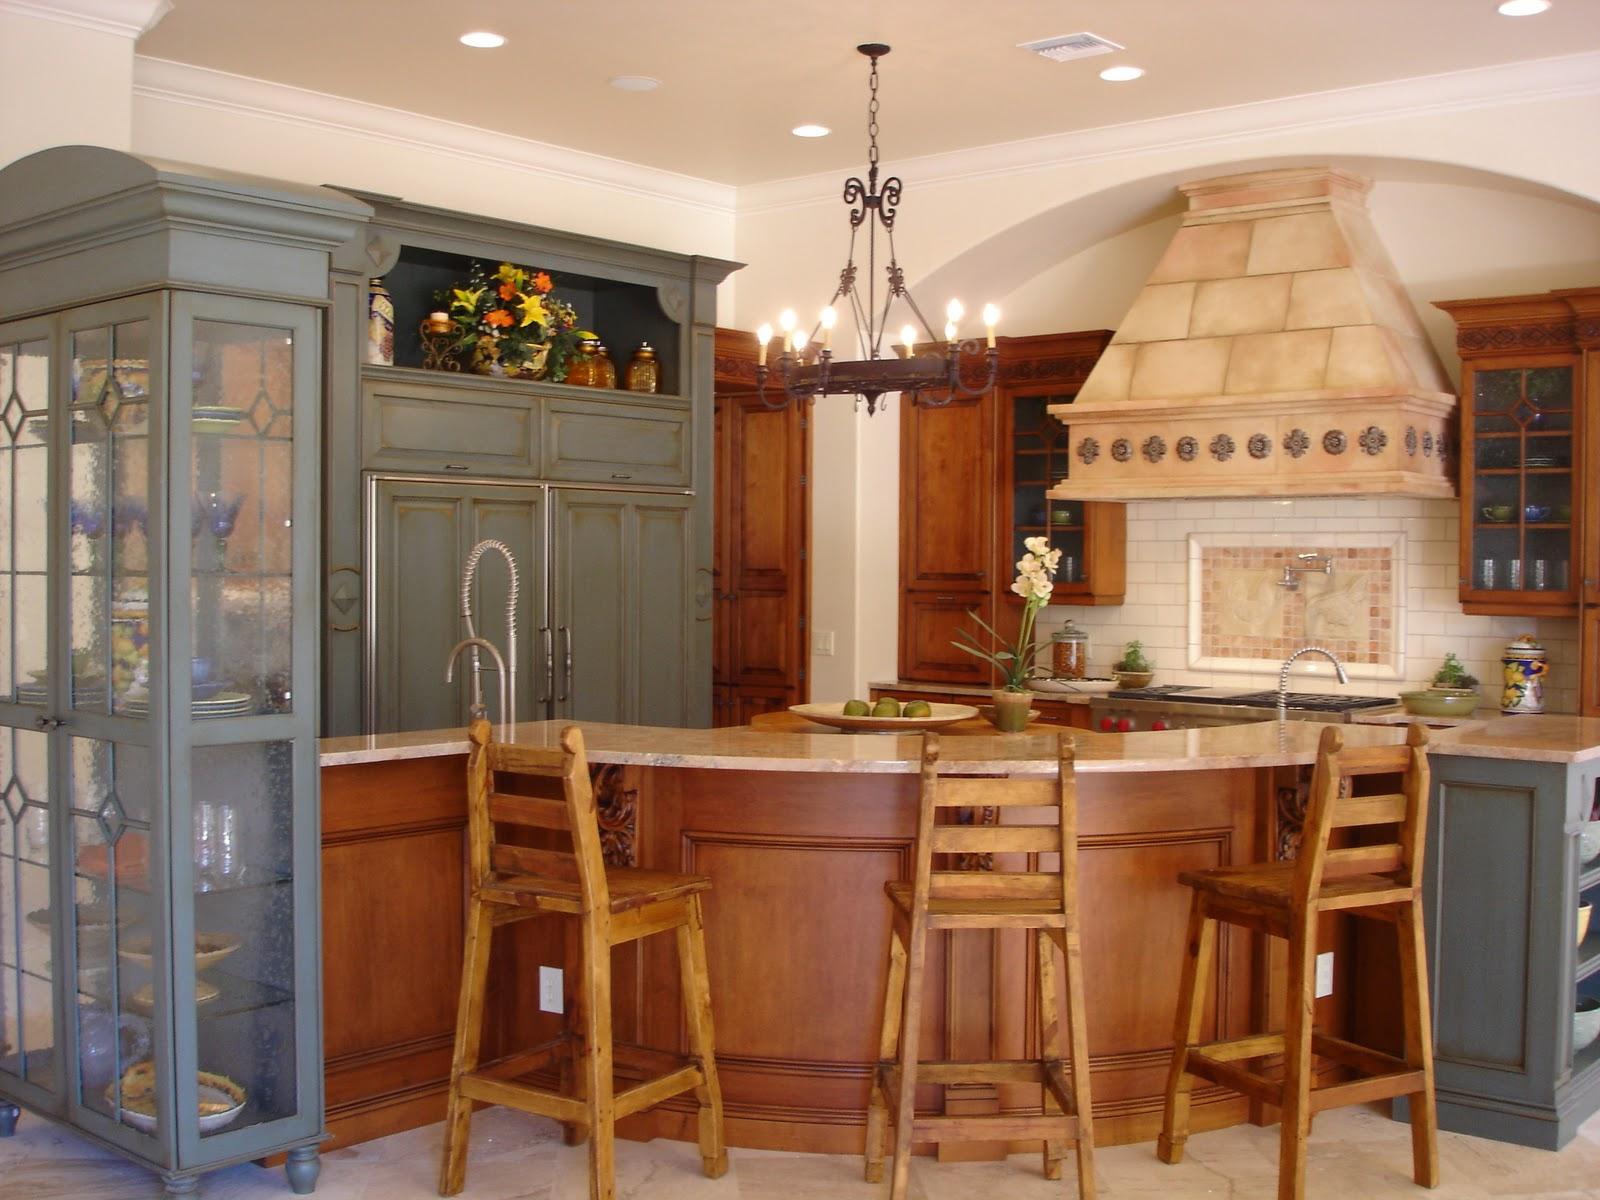 tuscan kitchen ideas 28 images amazing kitchens kitchen ideas